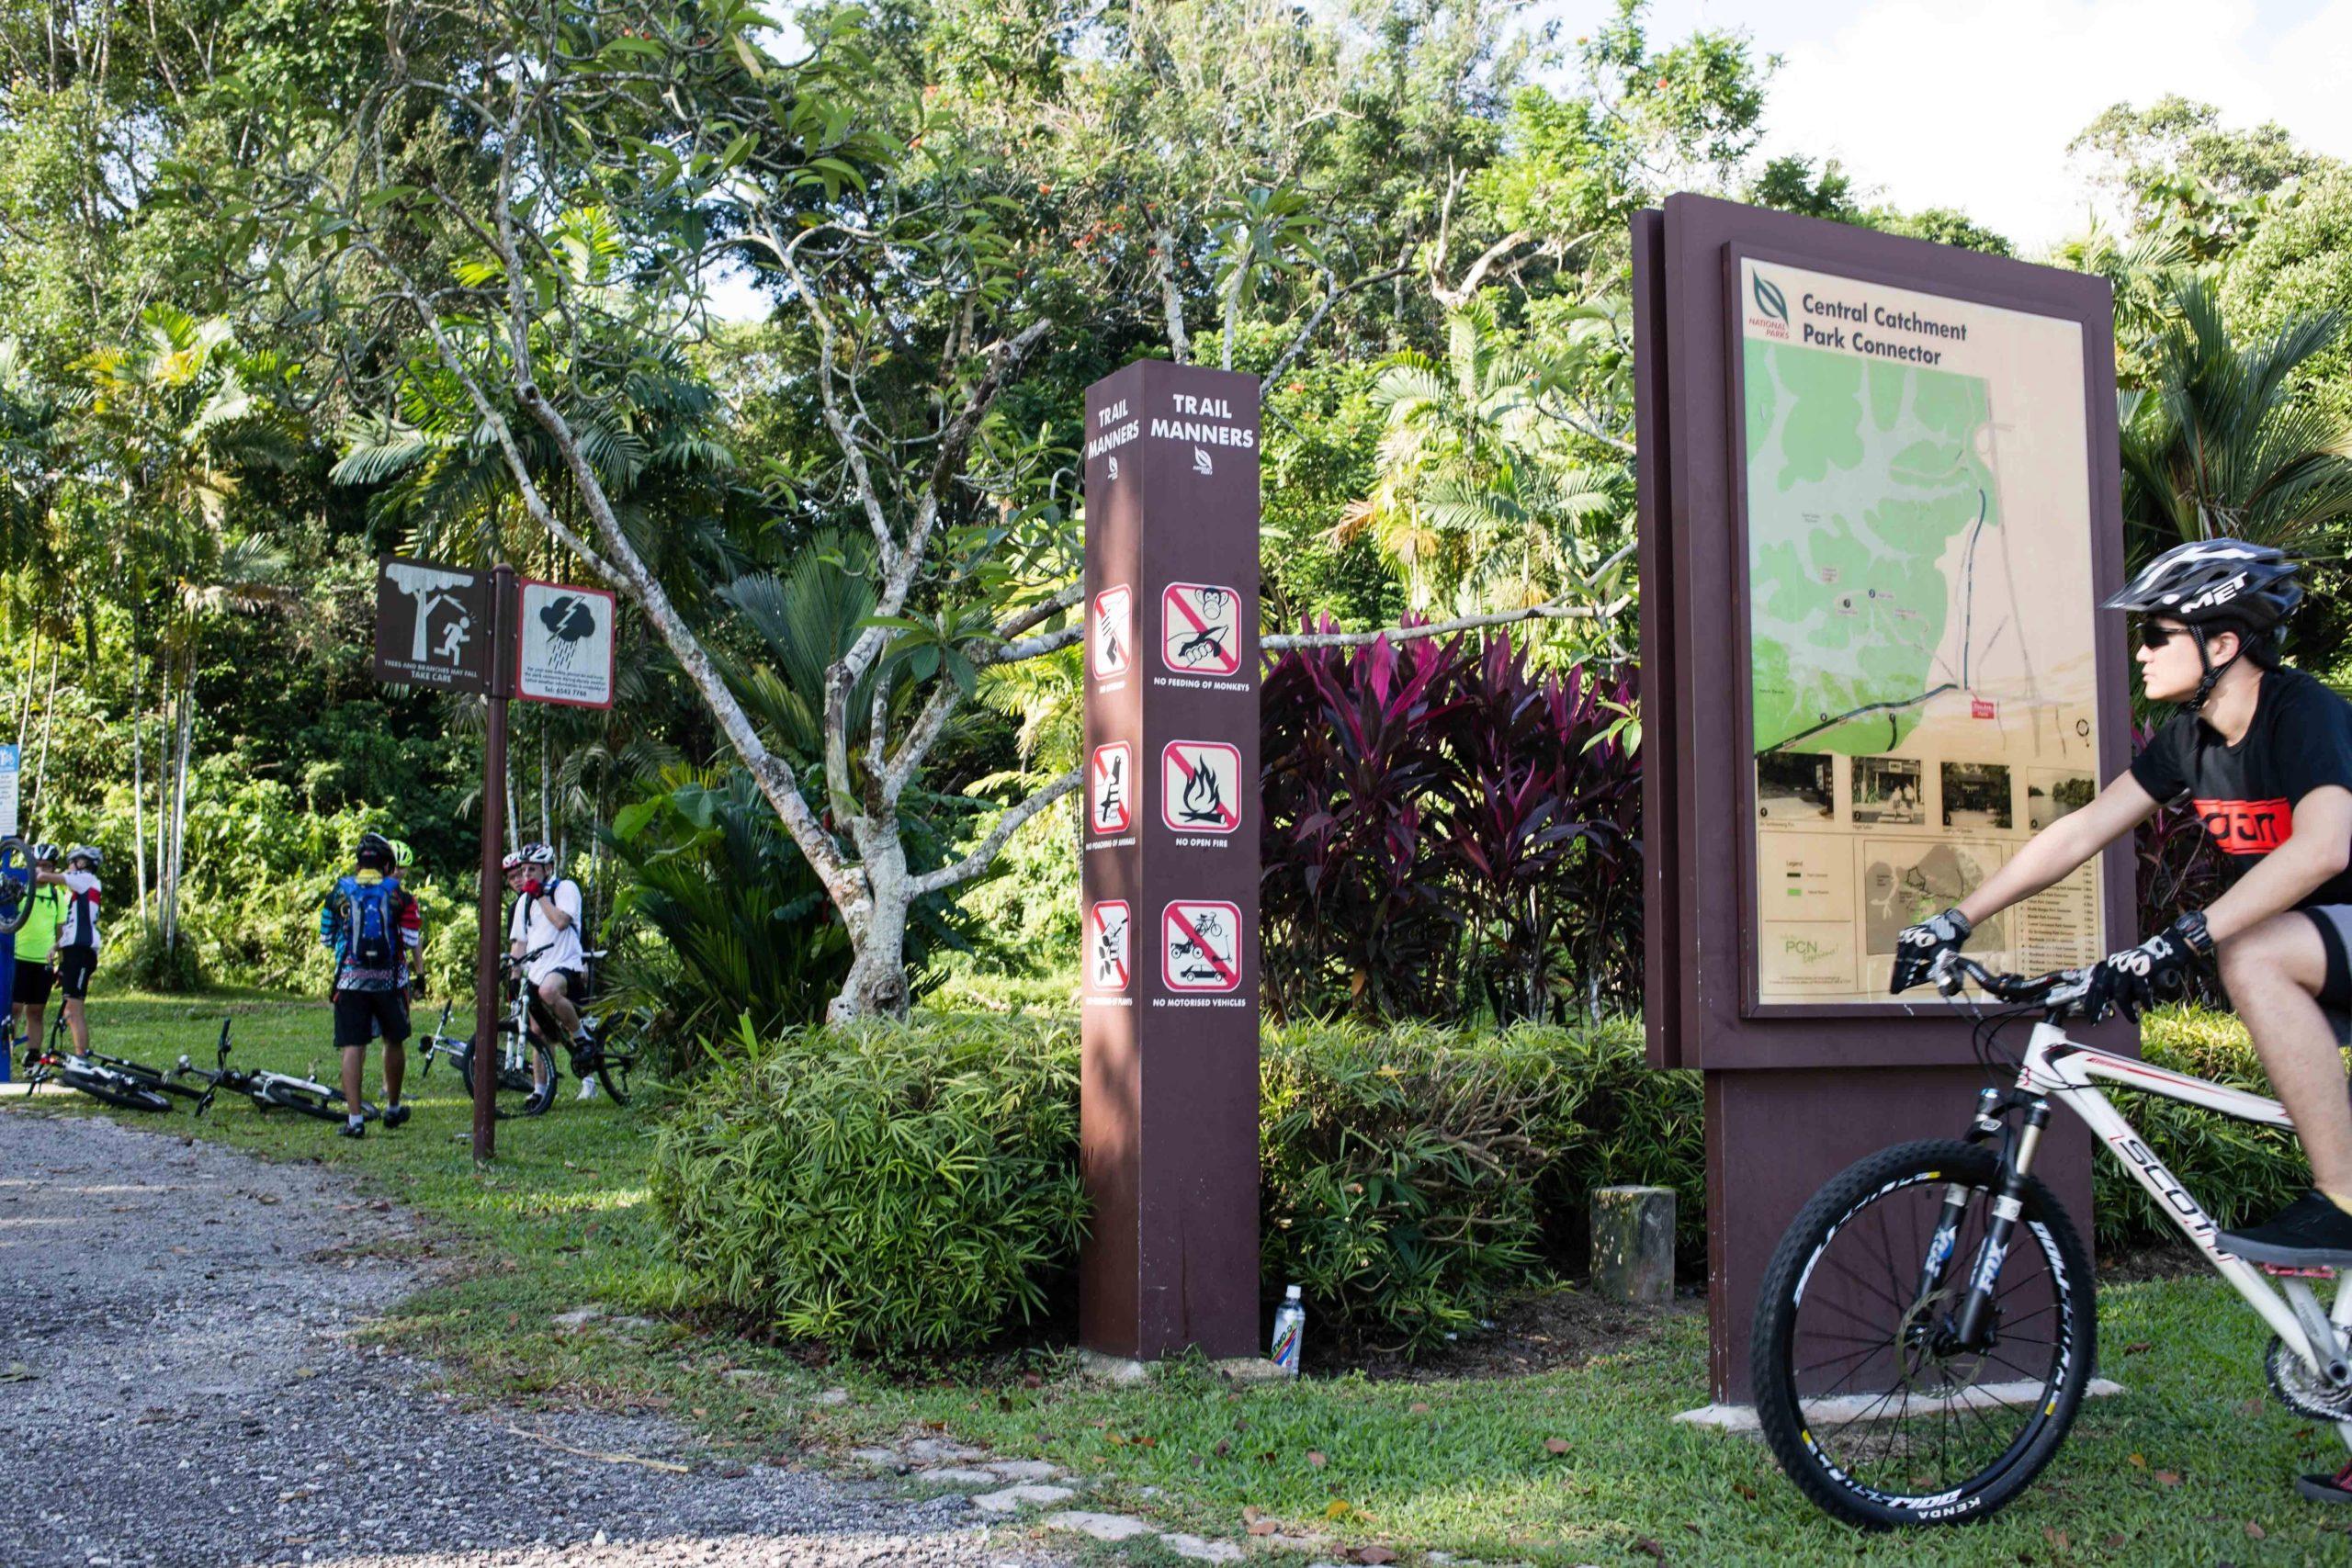 Kranji to Bukit Panjang w/ Mandai T15  Trail & Chestnut Park Observation Tower (14km)